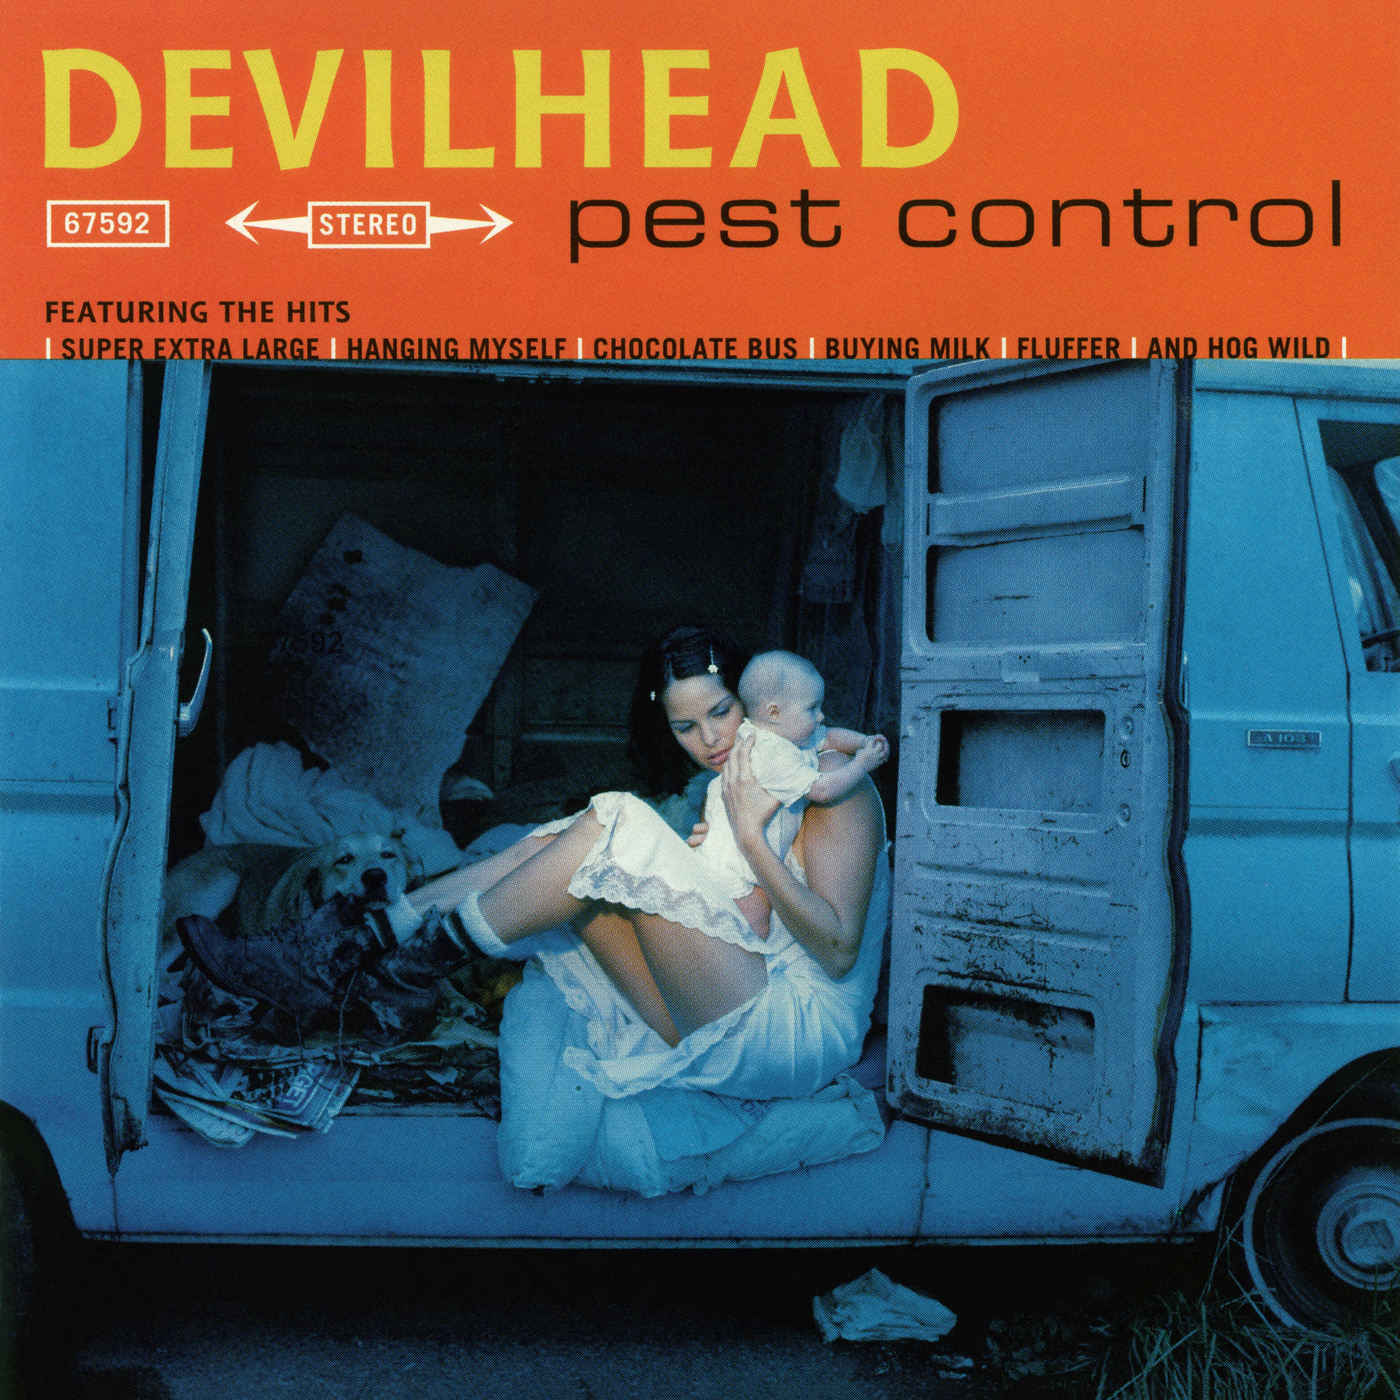 Pest Control - Devilhead